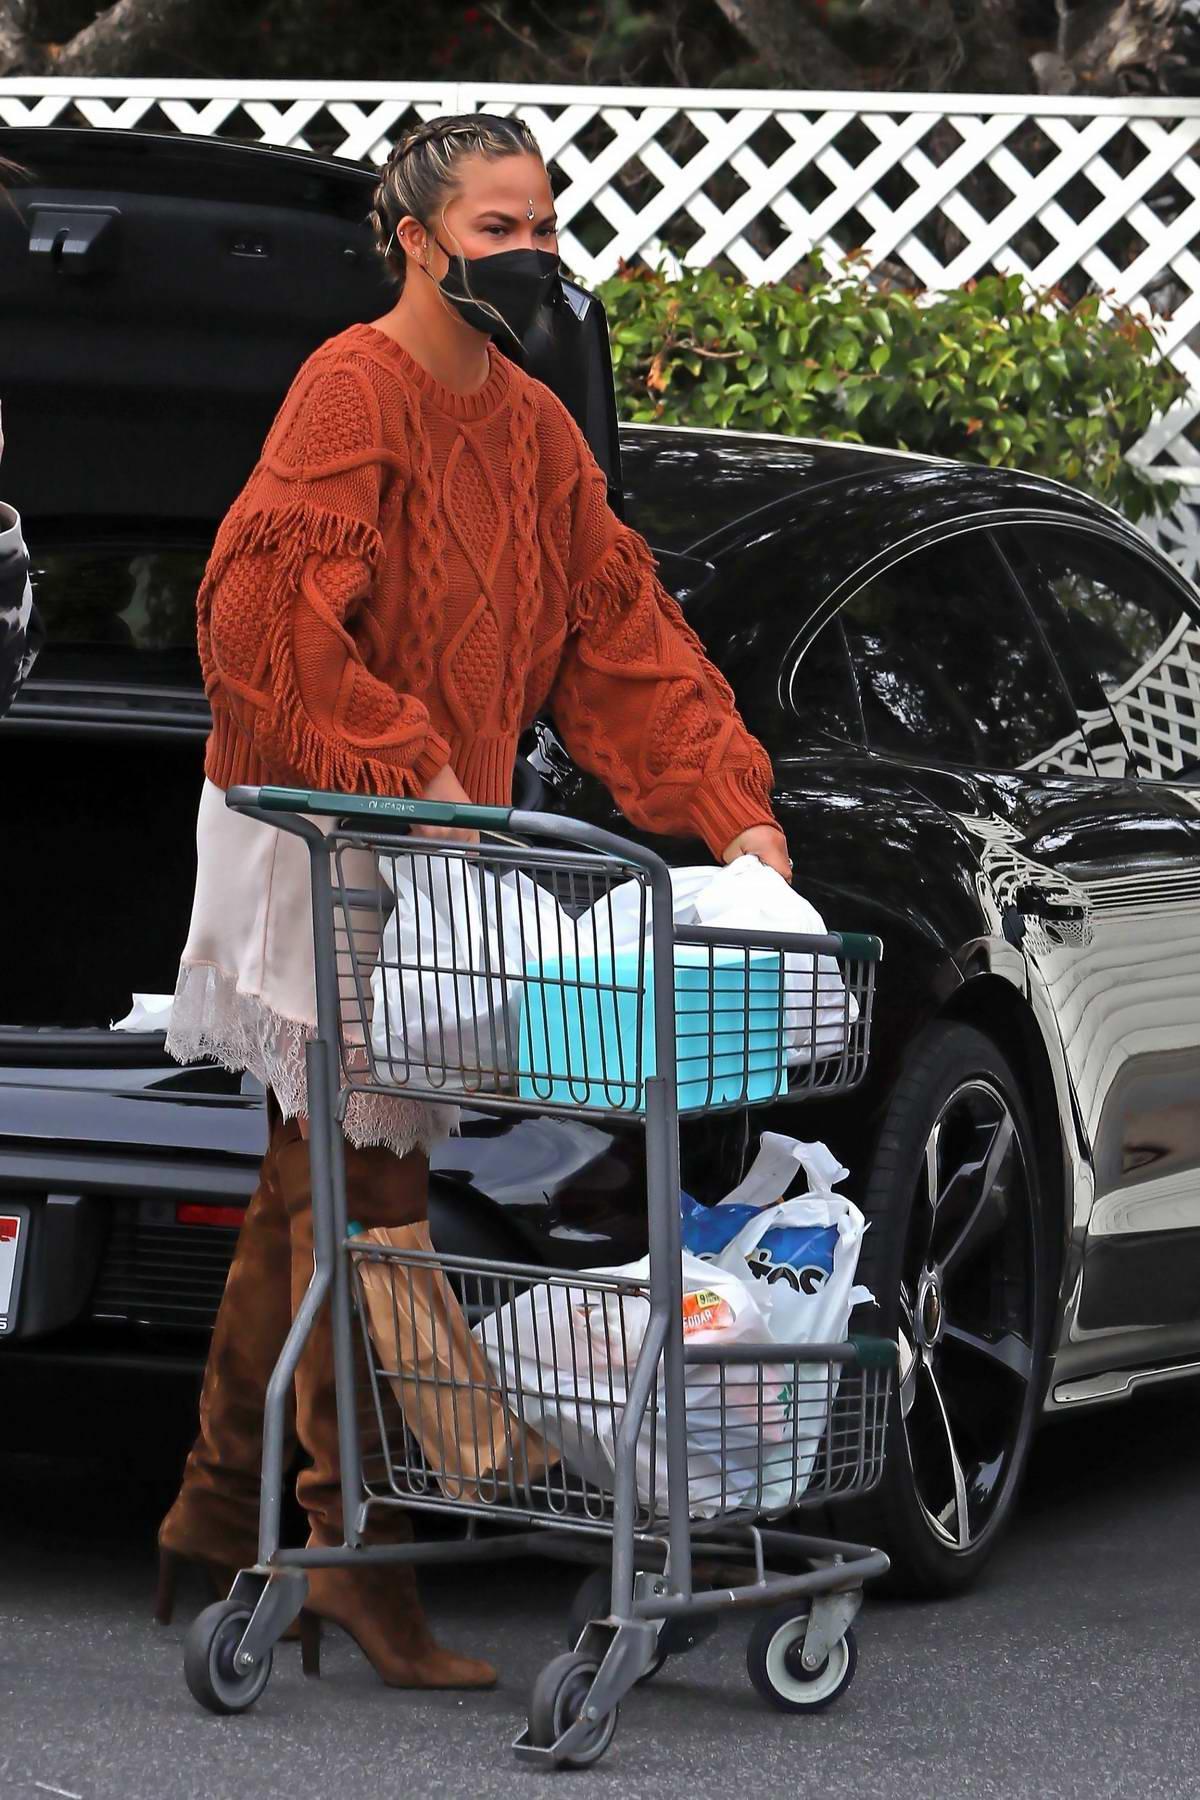 Chrissy Teigen grabs some essentials at Bristol Farms in Beverly Hills, California